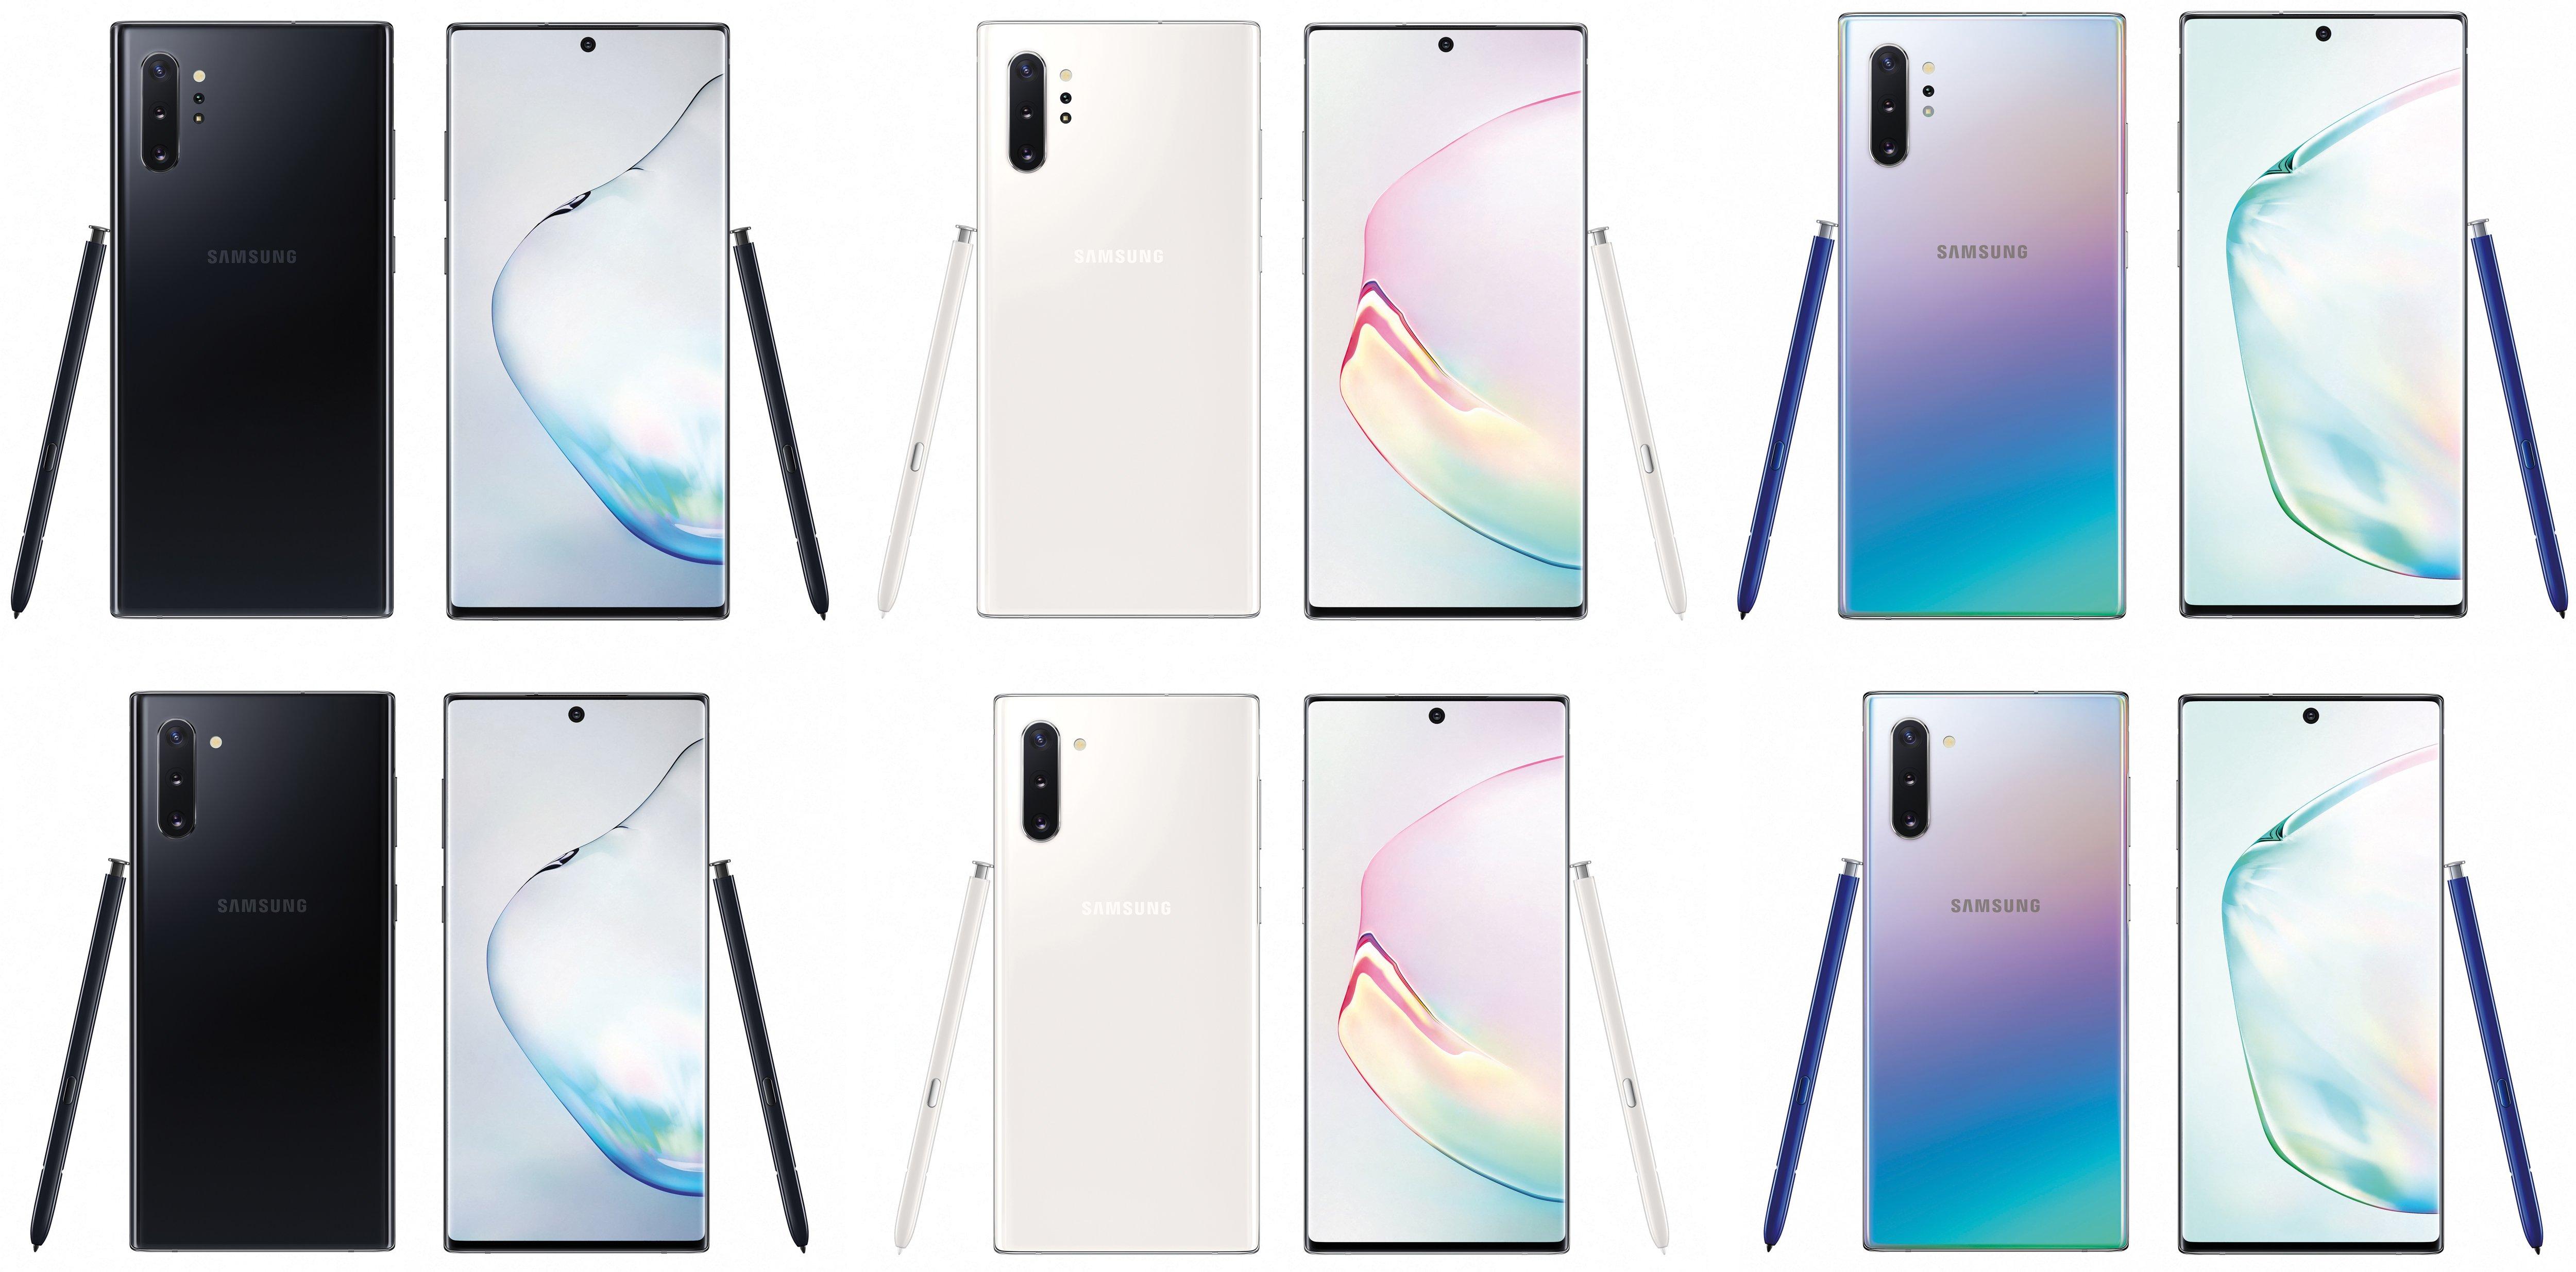 Samsung GALAXY NOTE 10 IMPRESIONEAZA intr-o noua Imagine culori